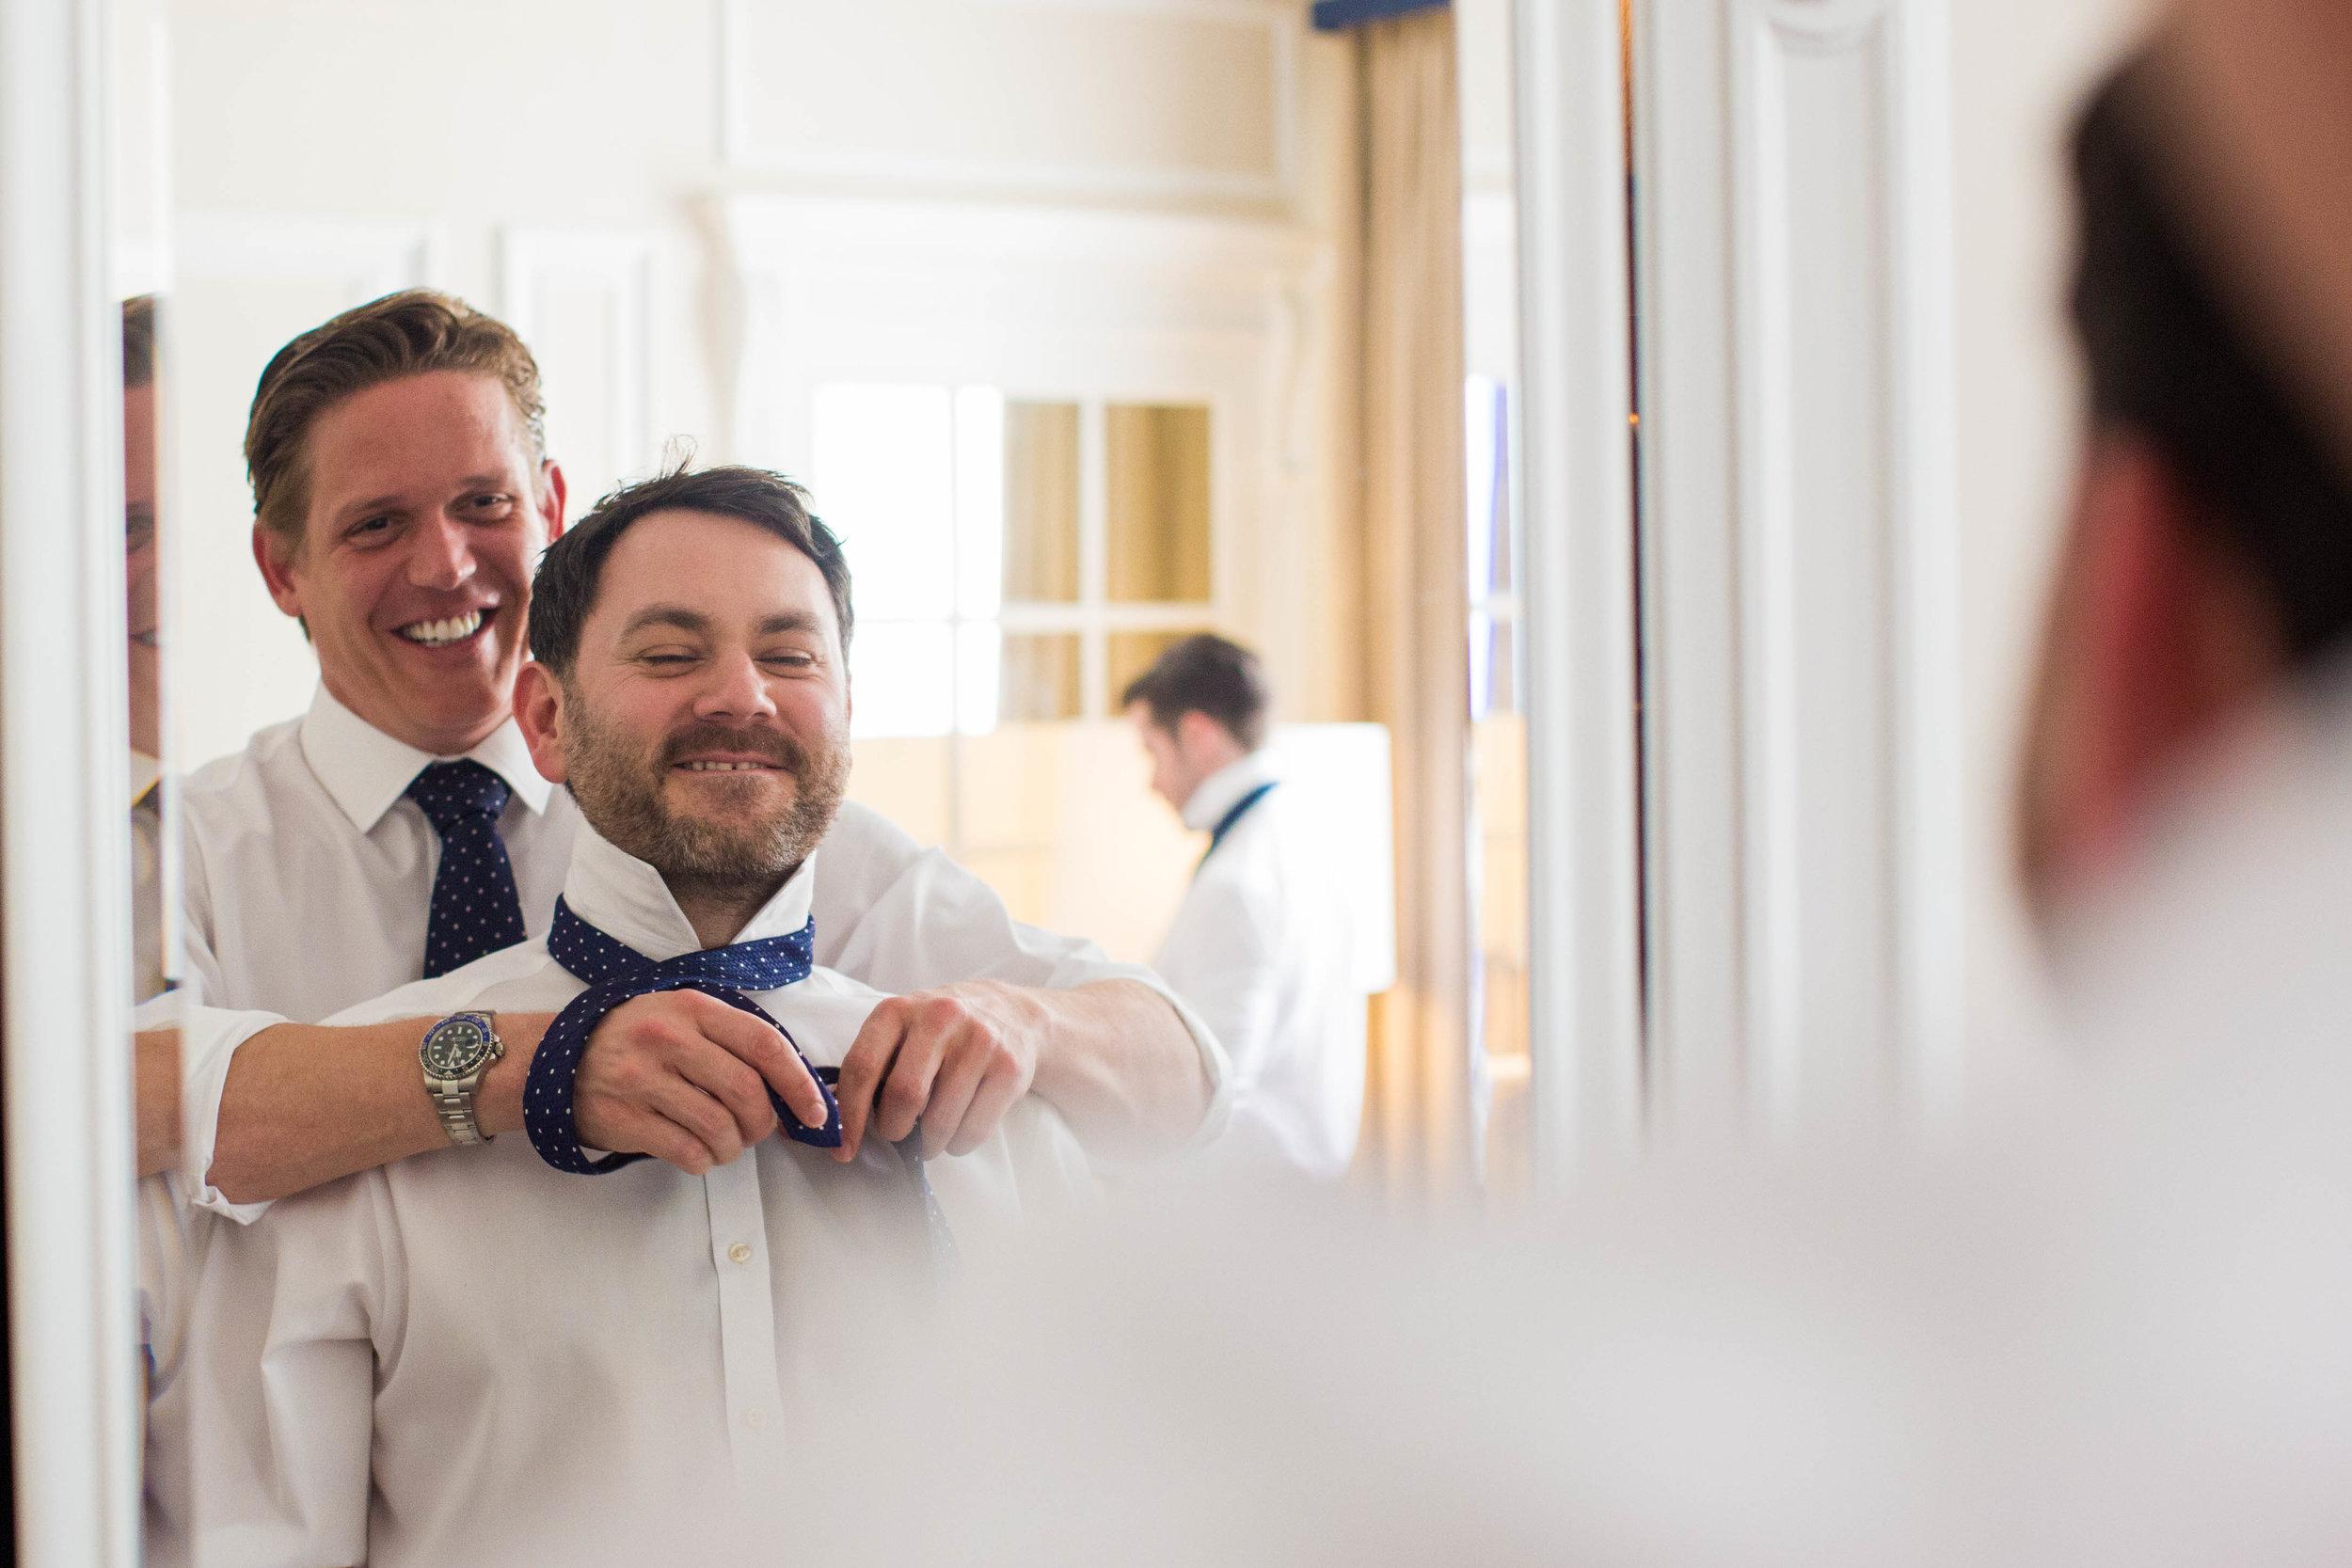 claridges-hotel-wedding-photographer-london-mayfair-natalia-smith-photography-23.jpg